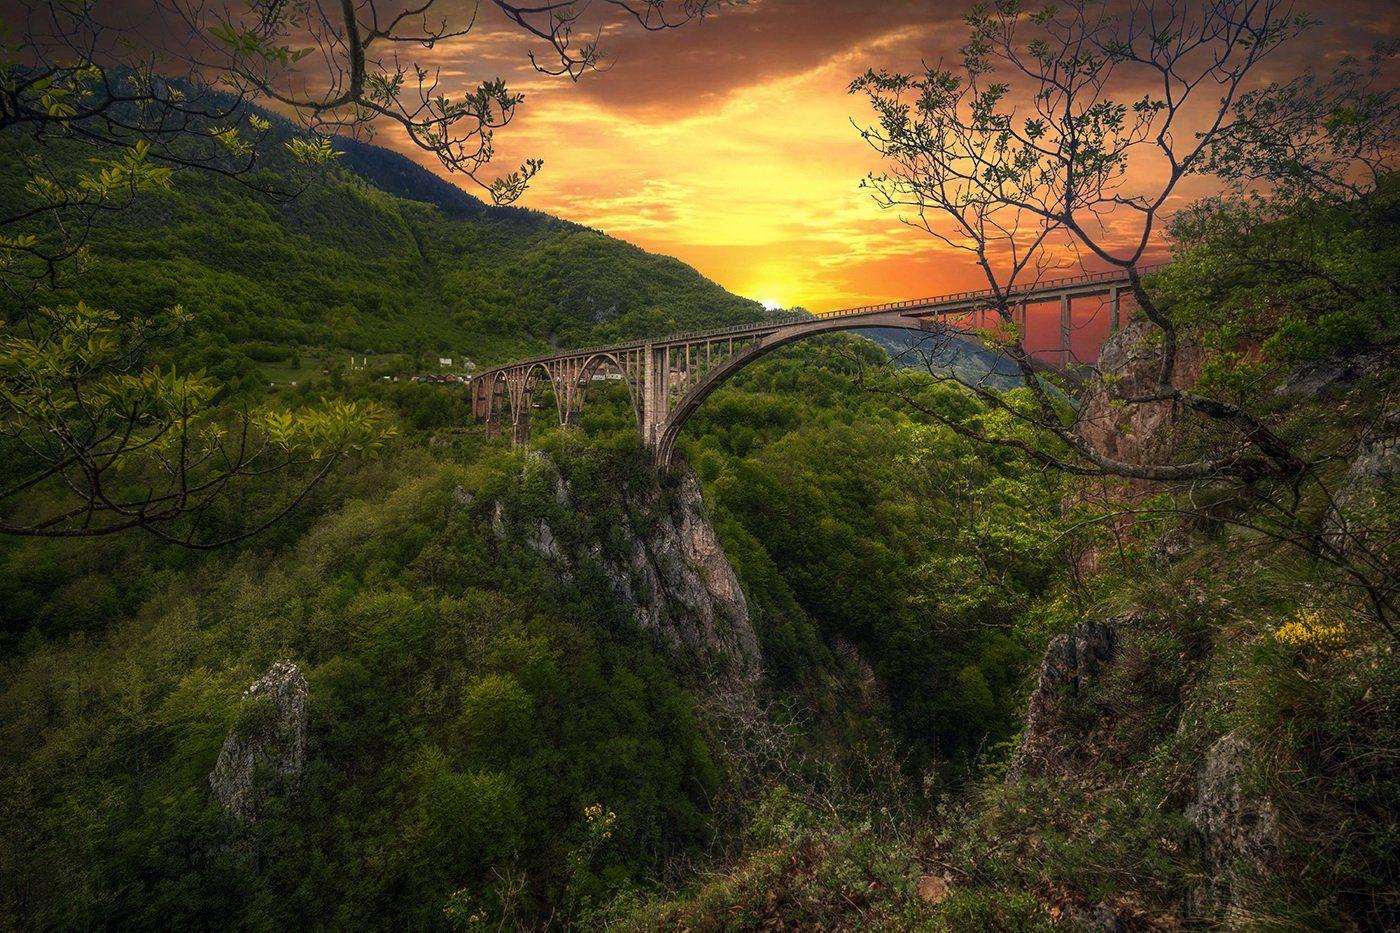 Черногория, река Тара, мост Джурджевича, арочный мост, каньон, Montenegro, GaL-Lina